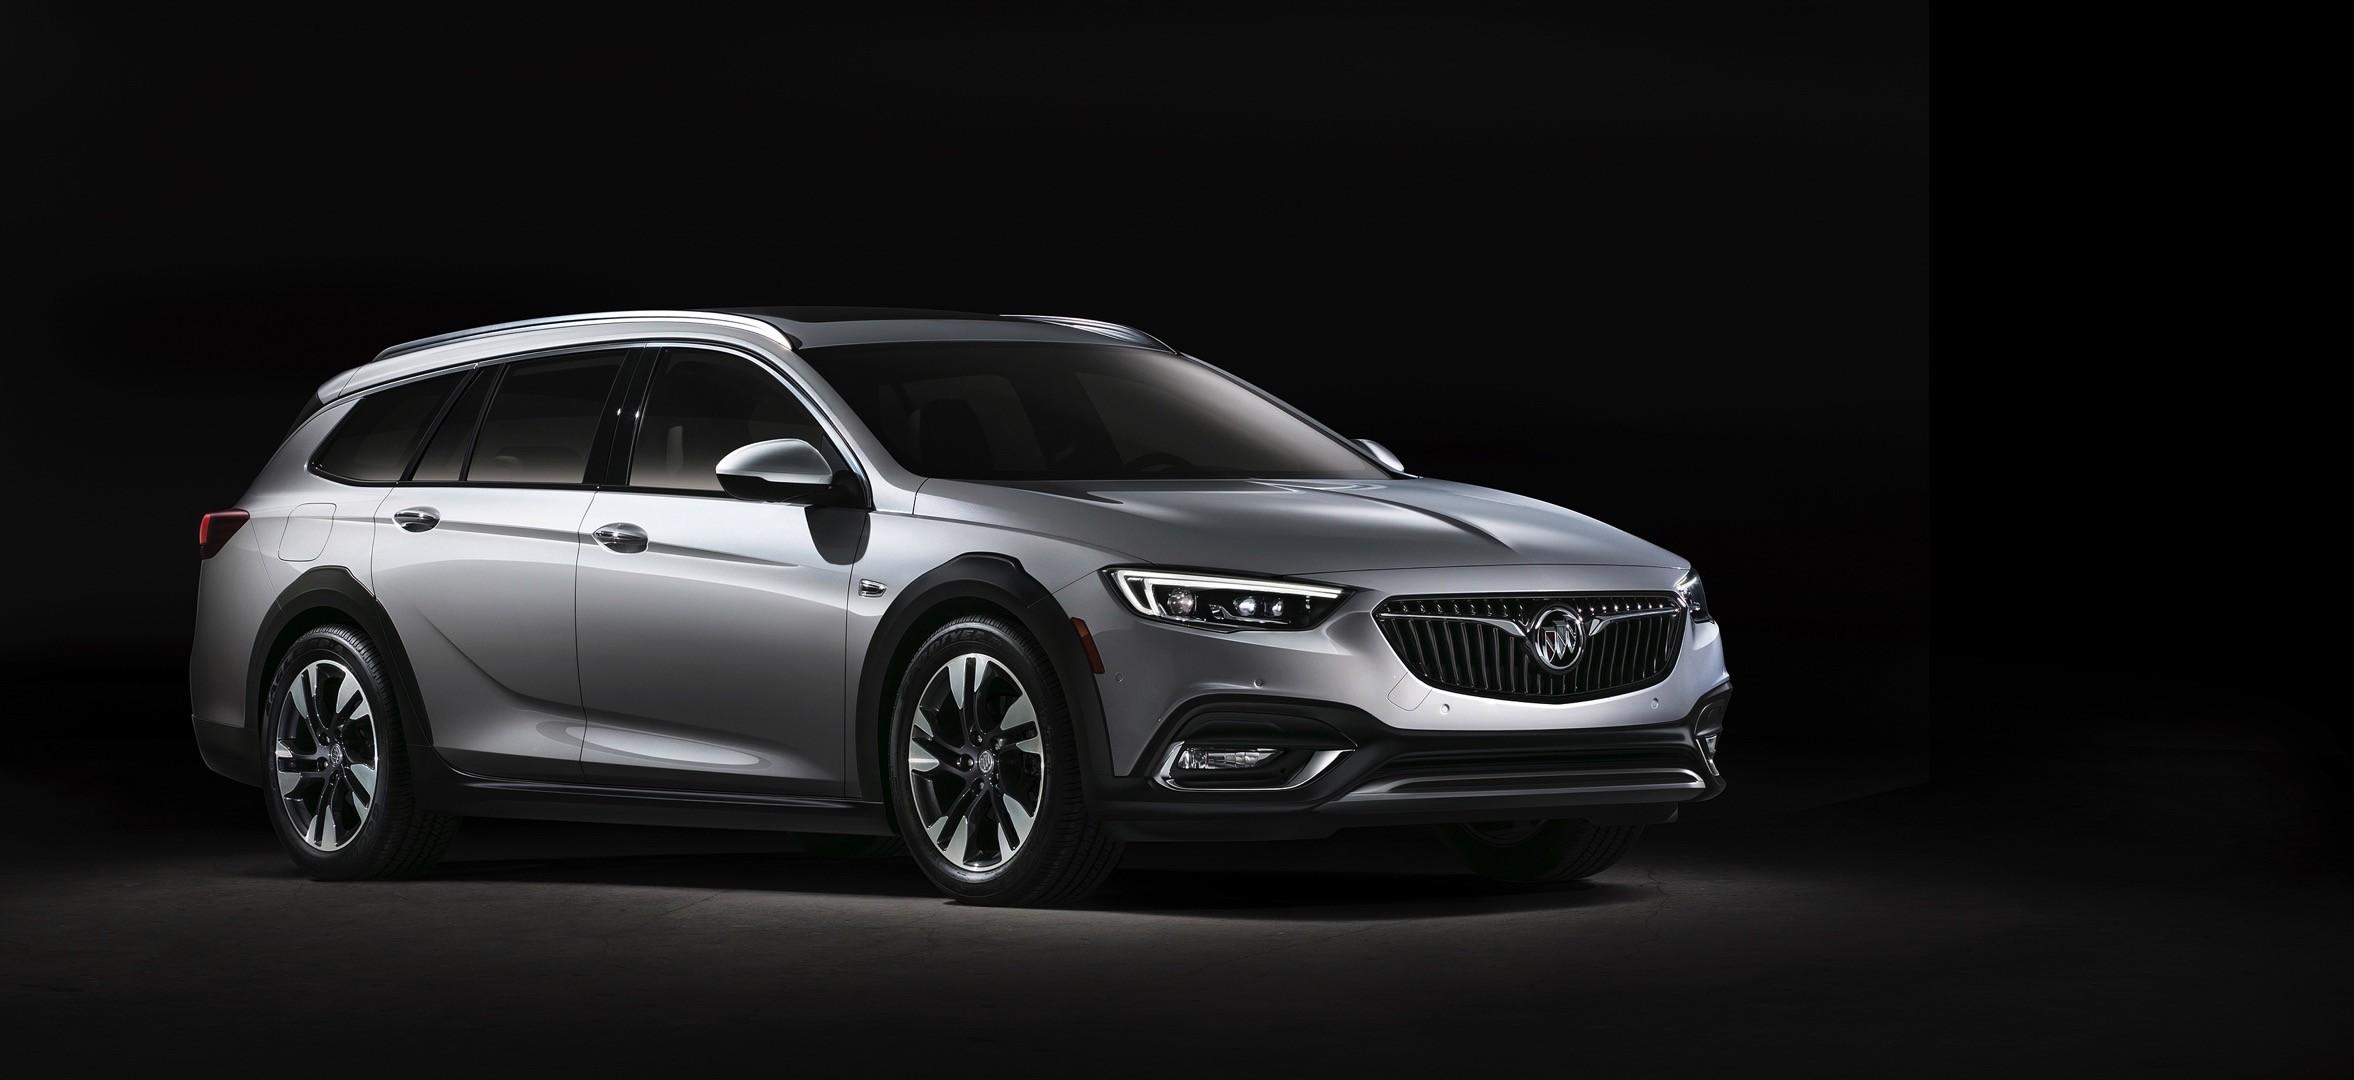 Buick Introduces 2018 Regal Sportback Sedan And 2018 Regal